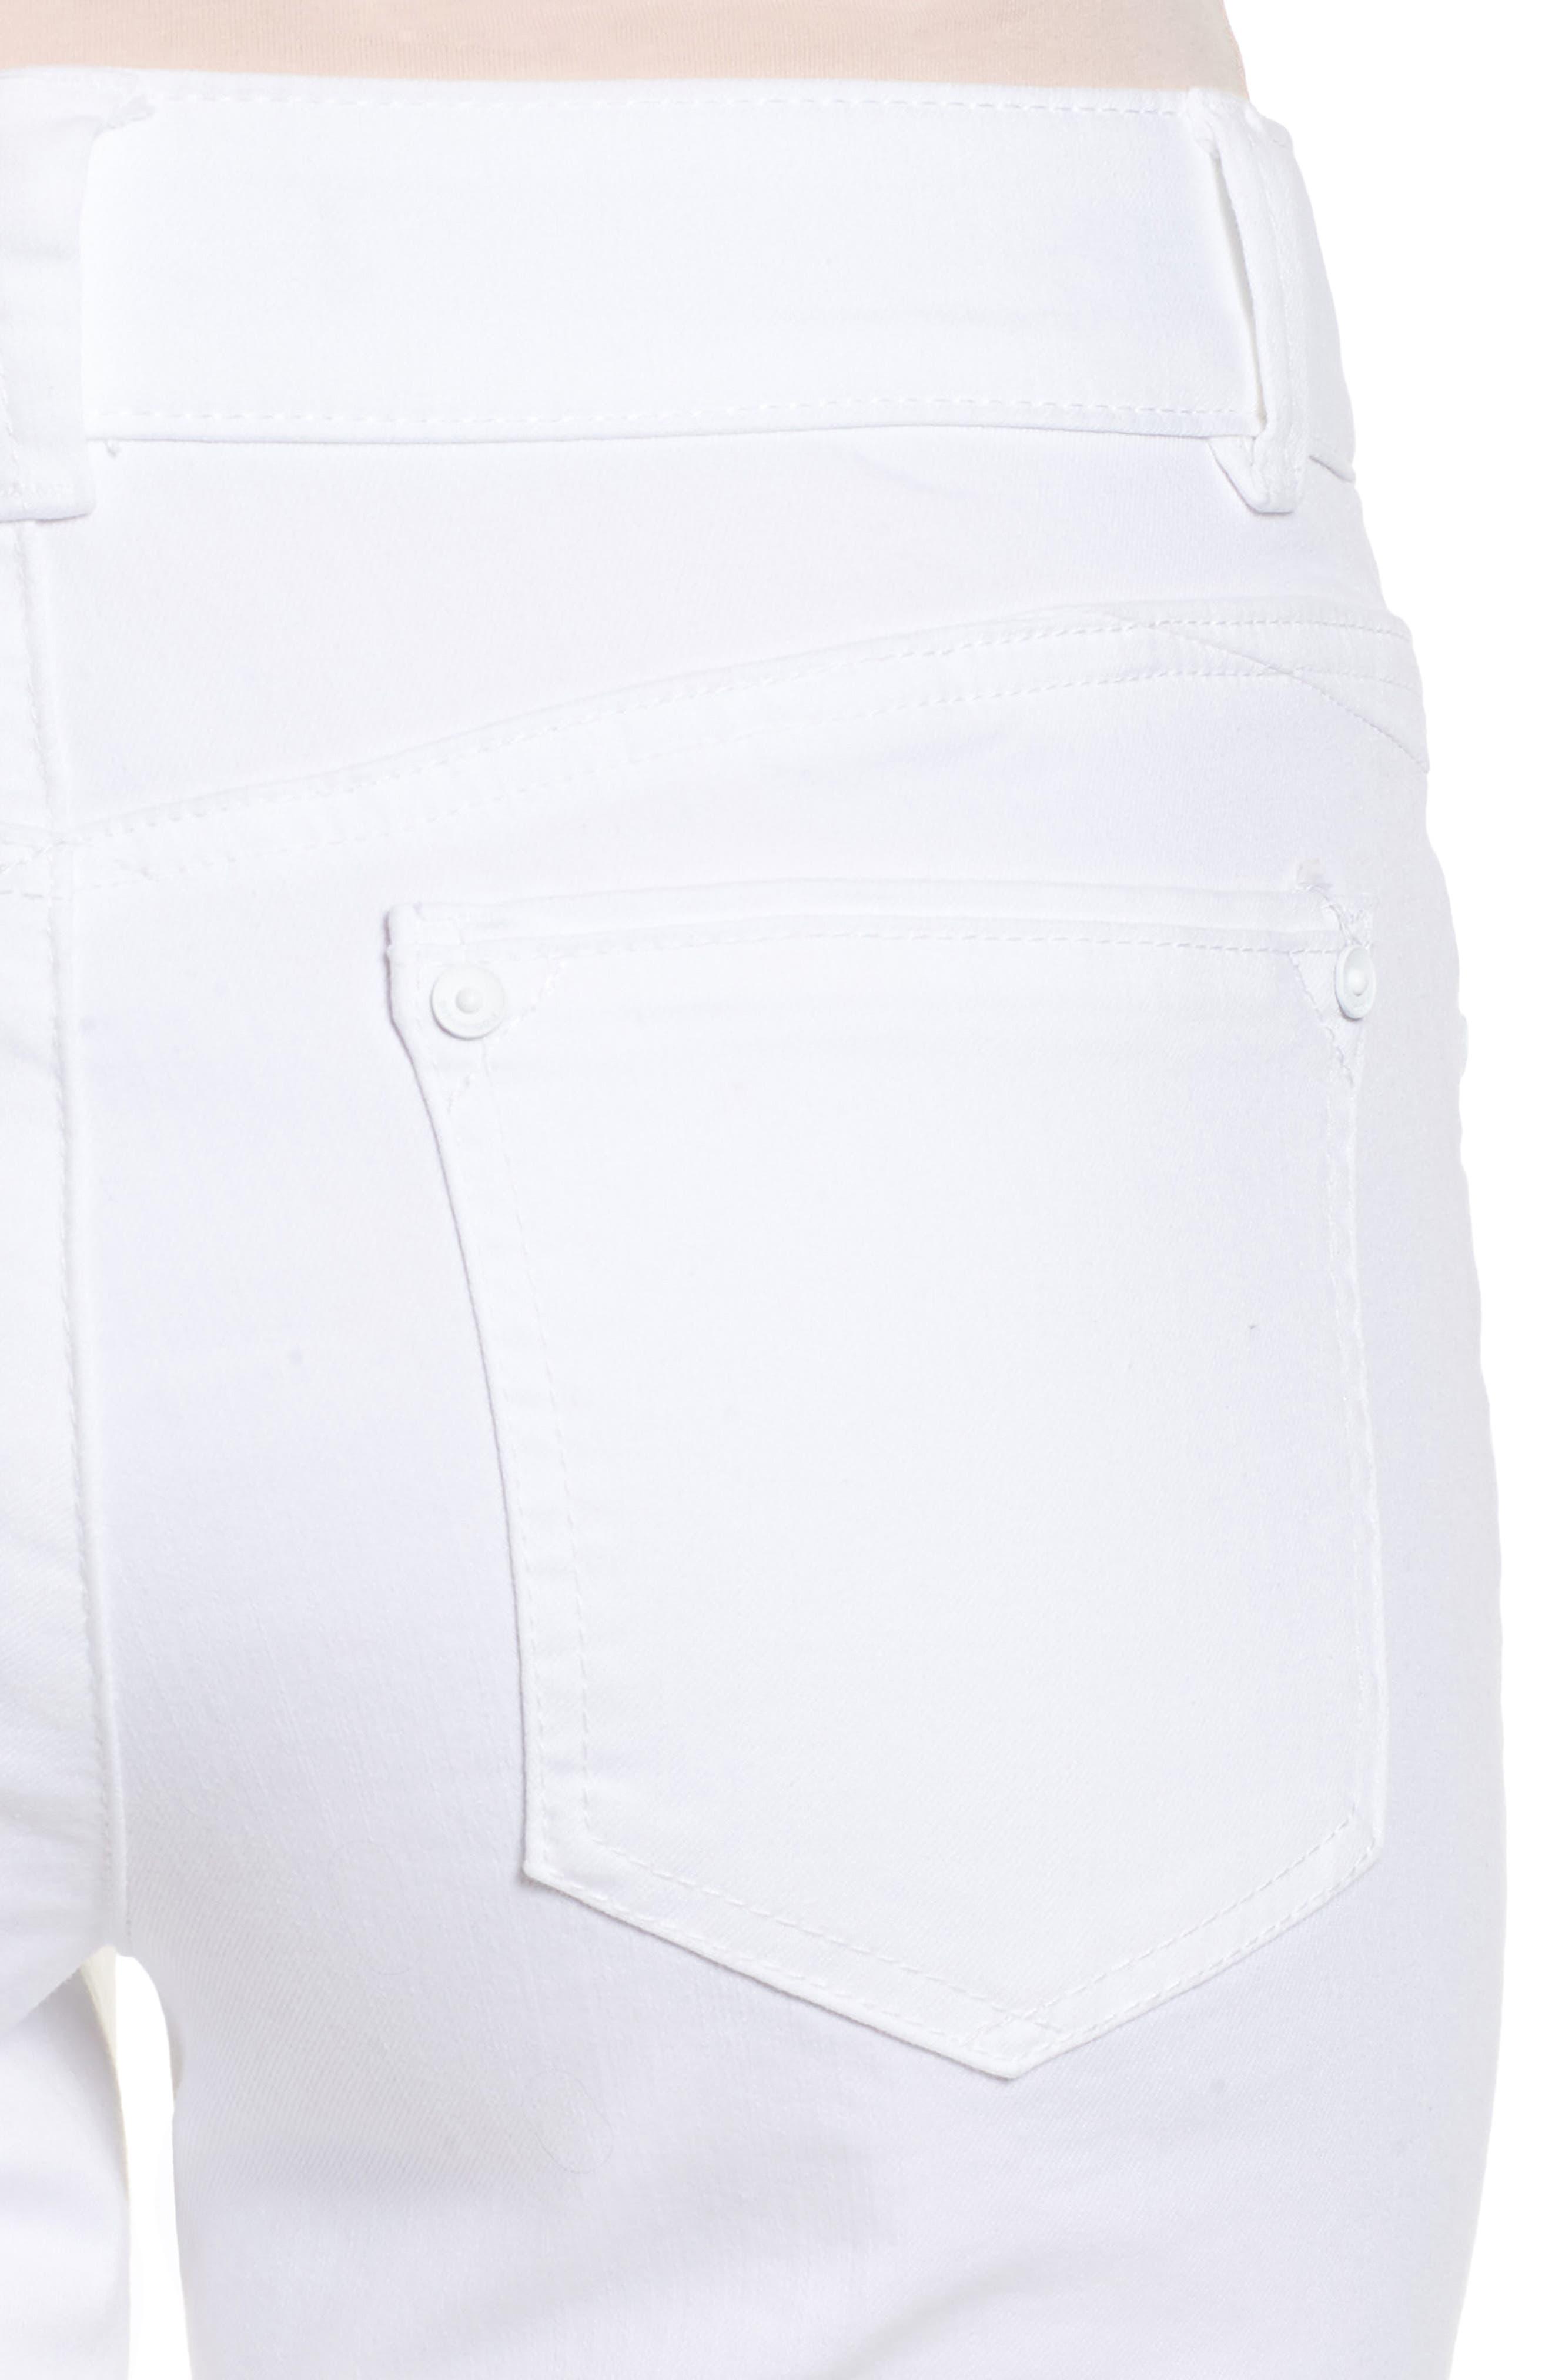 Ab-solution Ankle Skimmer Jeans,                             Alternate thumbnail 4, color,                             Optic White